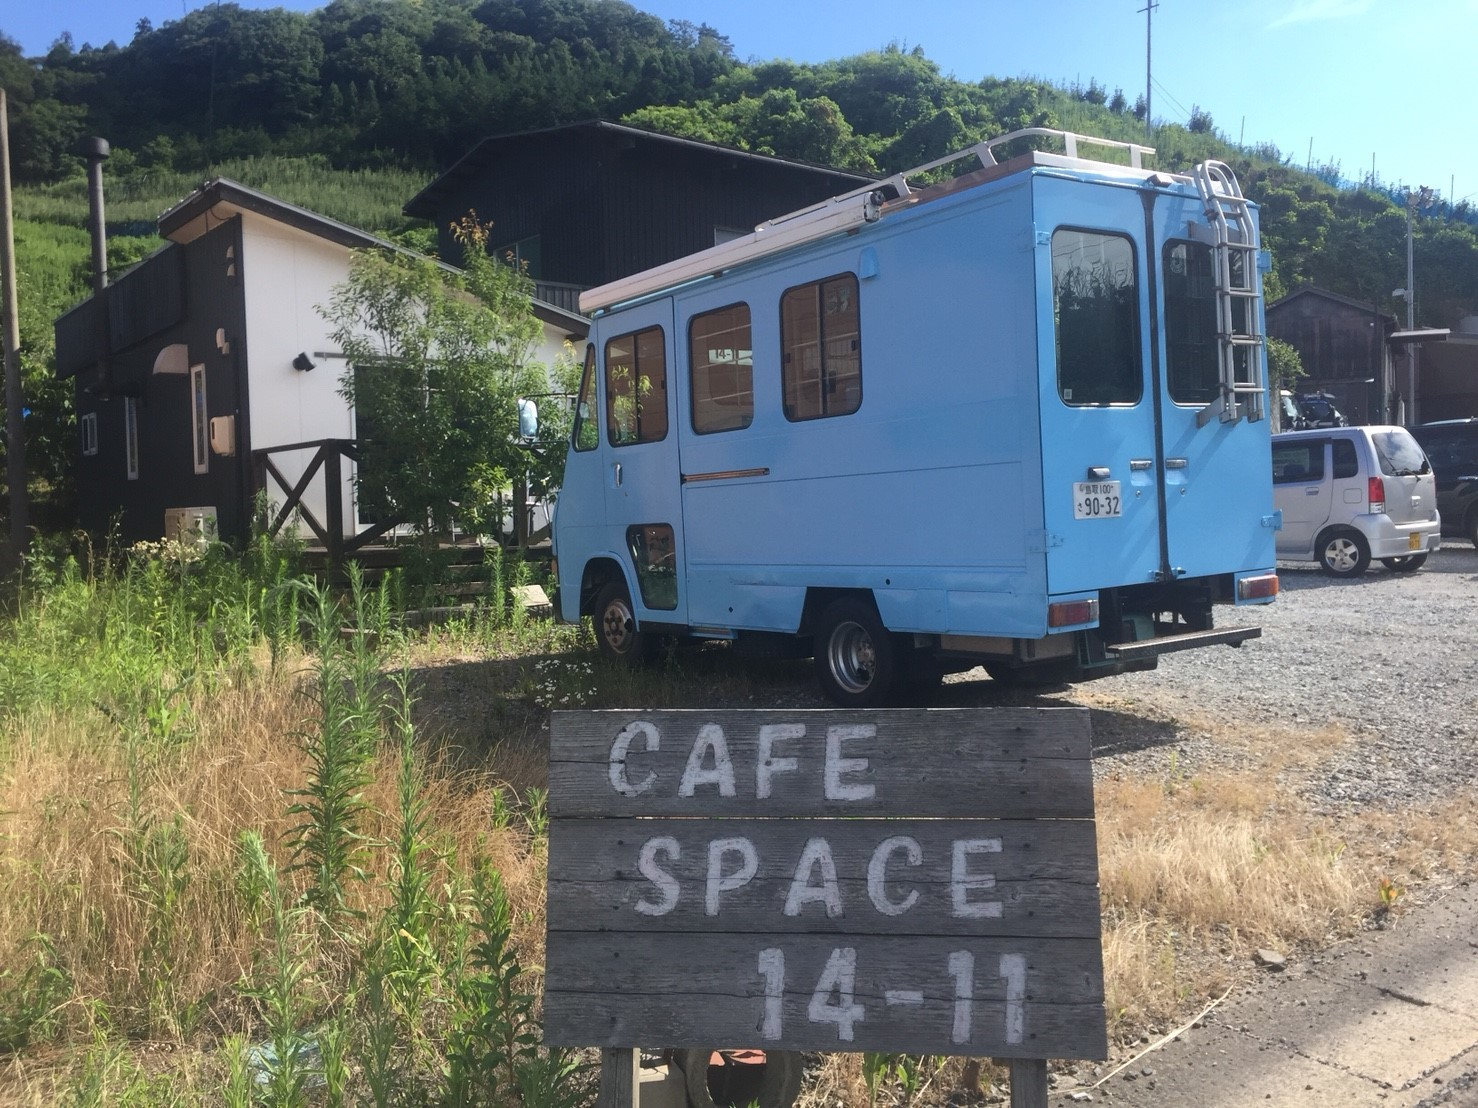 CAFE SPACE 14-11_e0115904_16252824.jpg